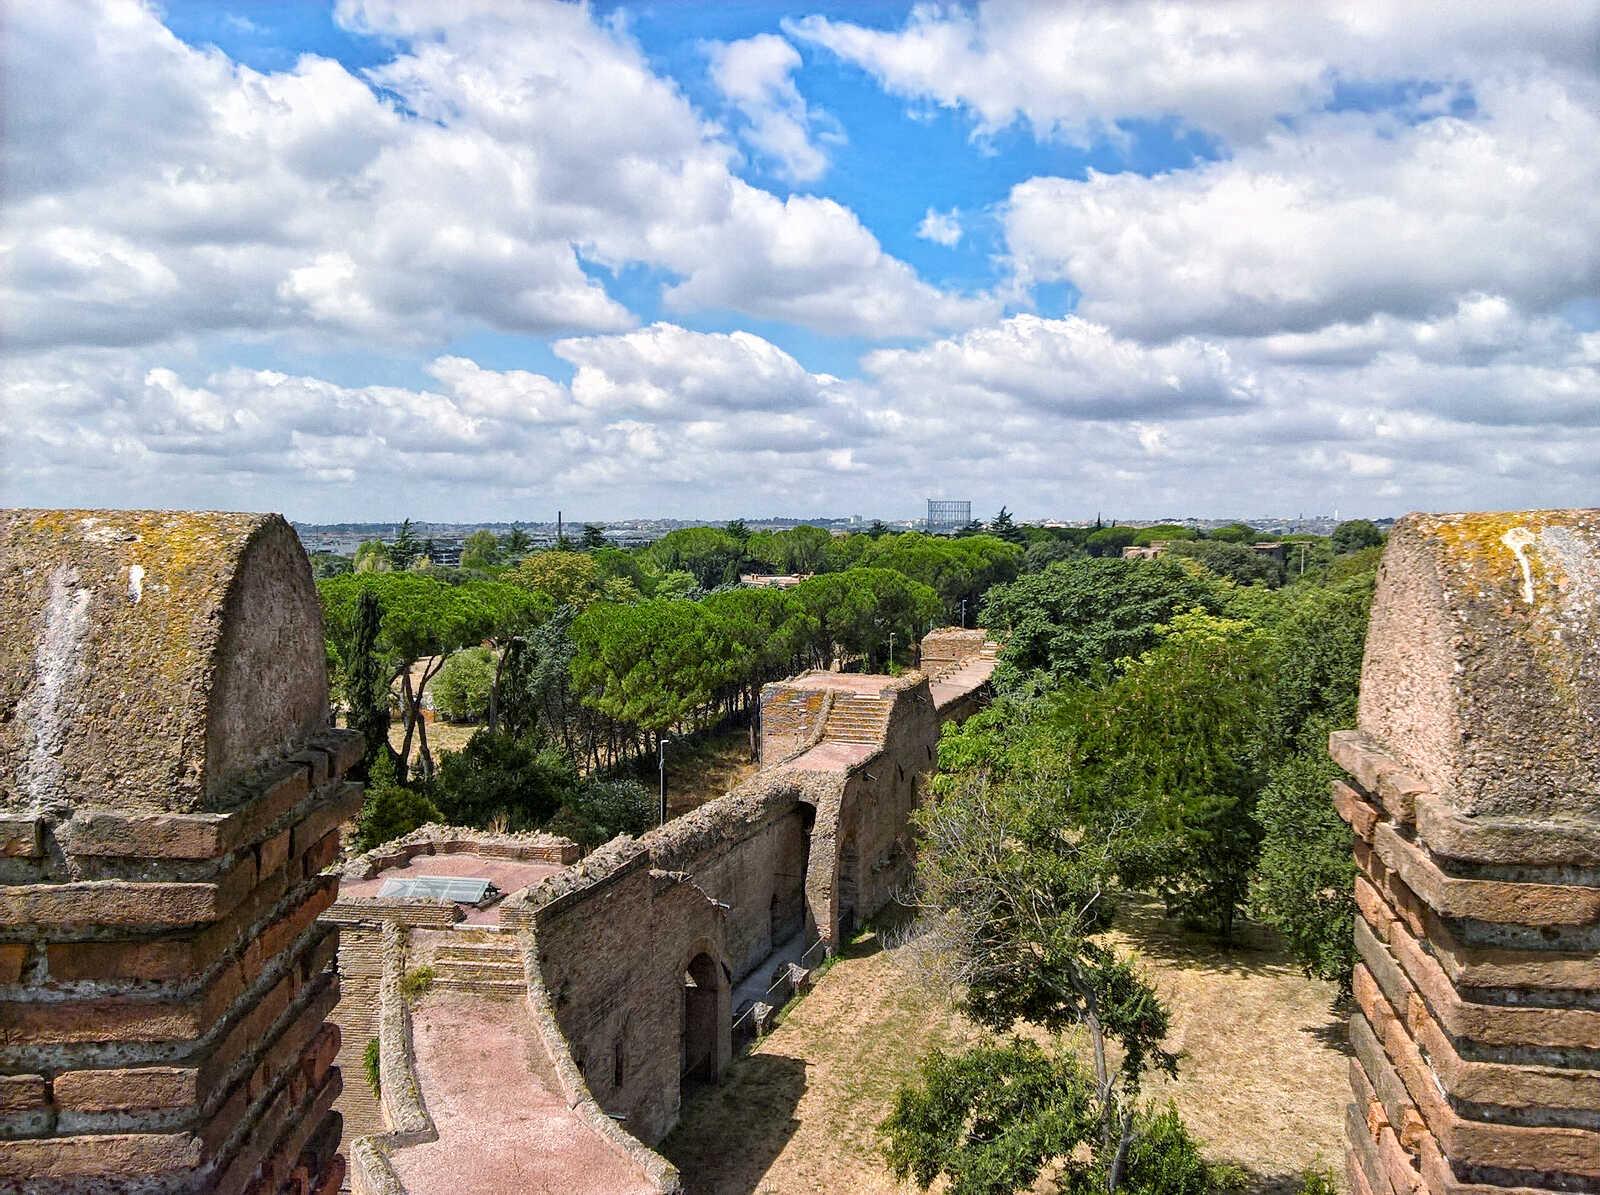 Aurelian Walls with distant Gazometro